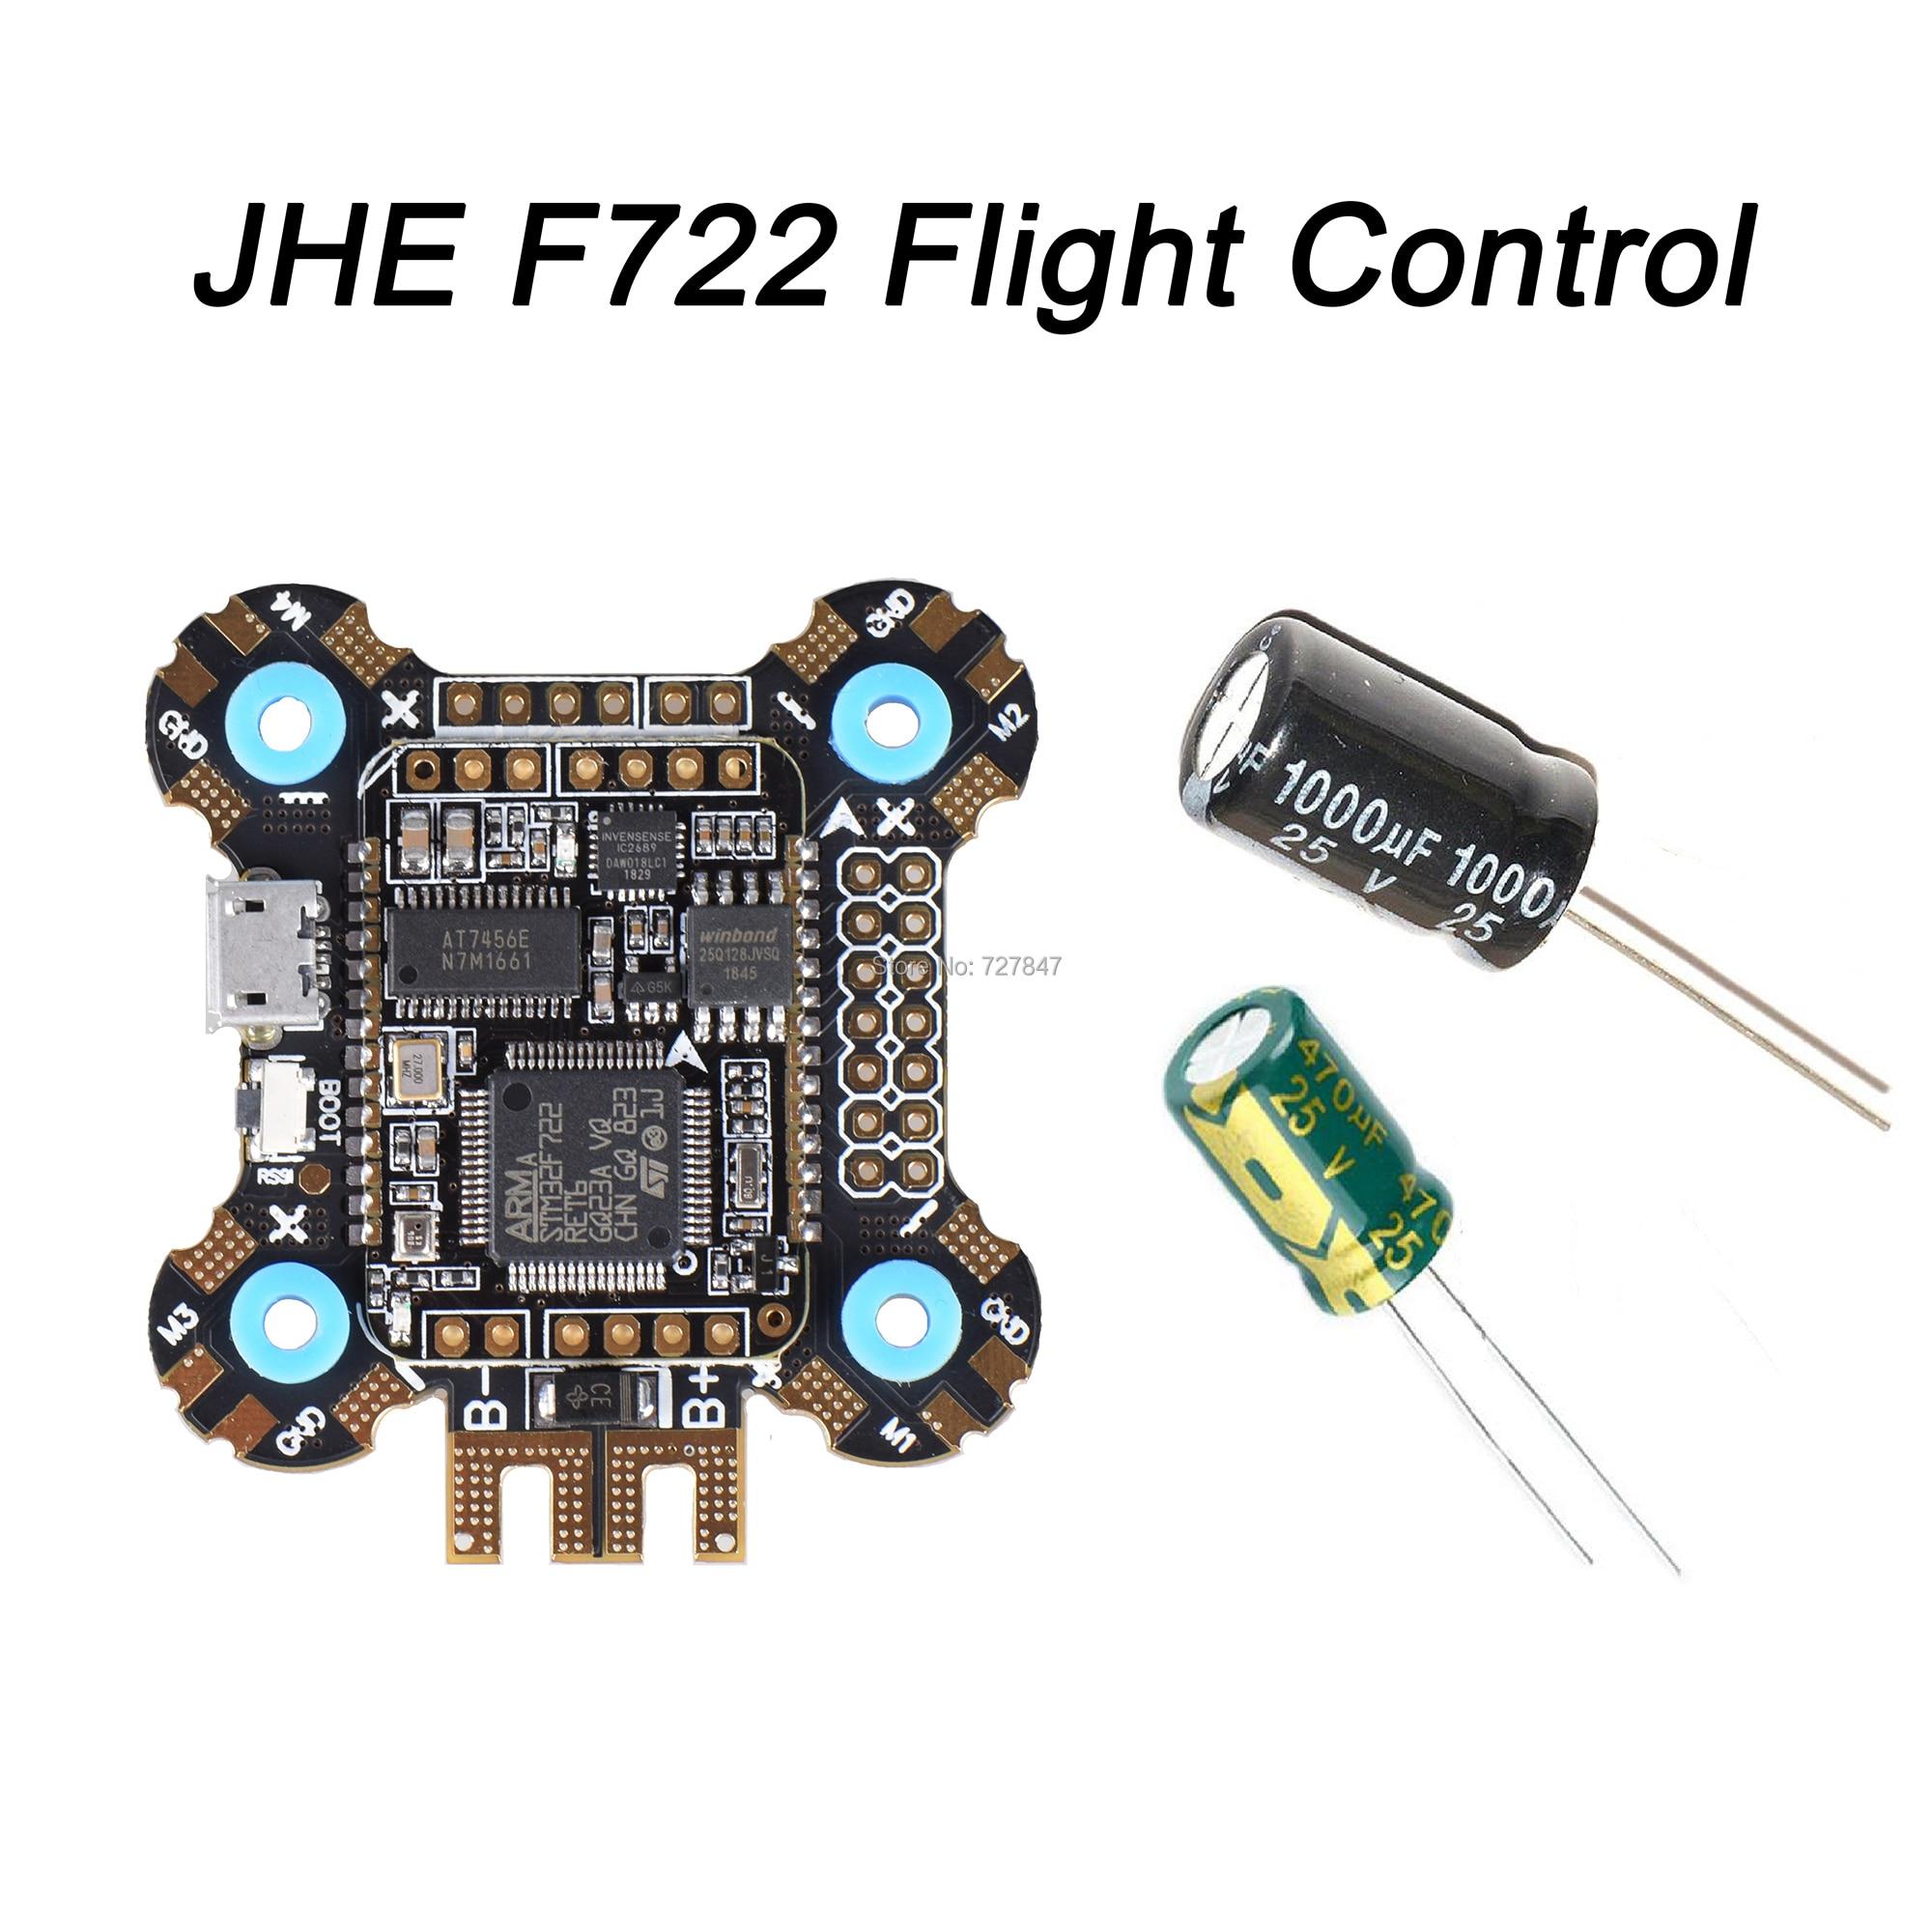 JHE F722 STM32F722 Flight Controller Built in OSD BMP280 Barometer BEC 5V for RC Models Multicopter